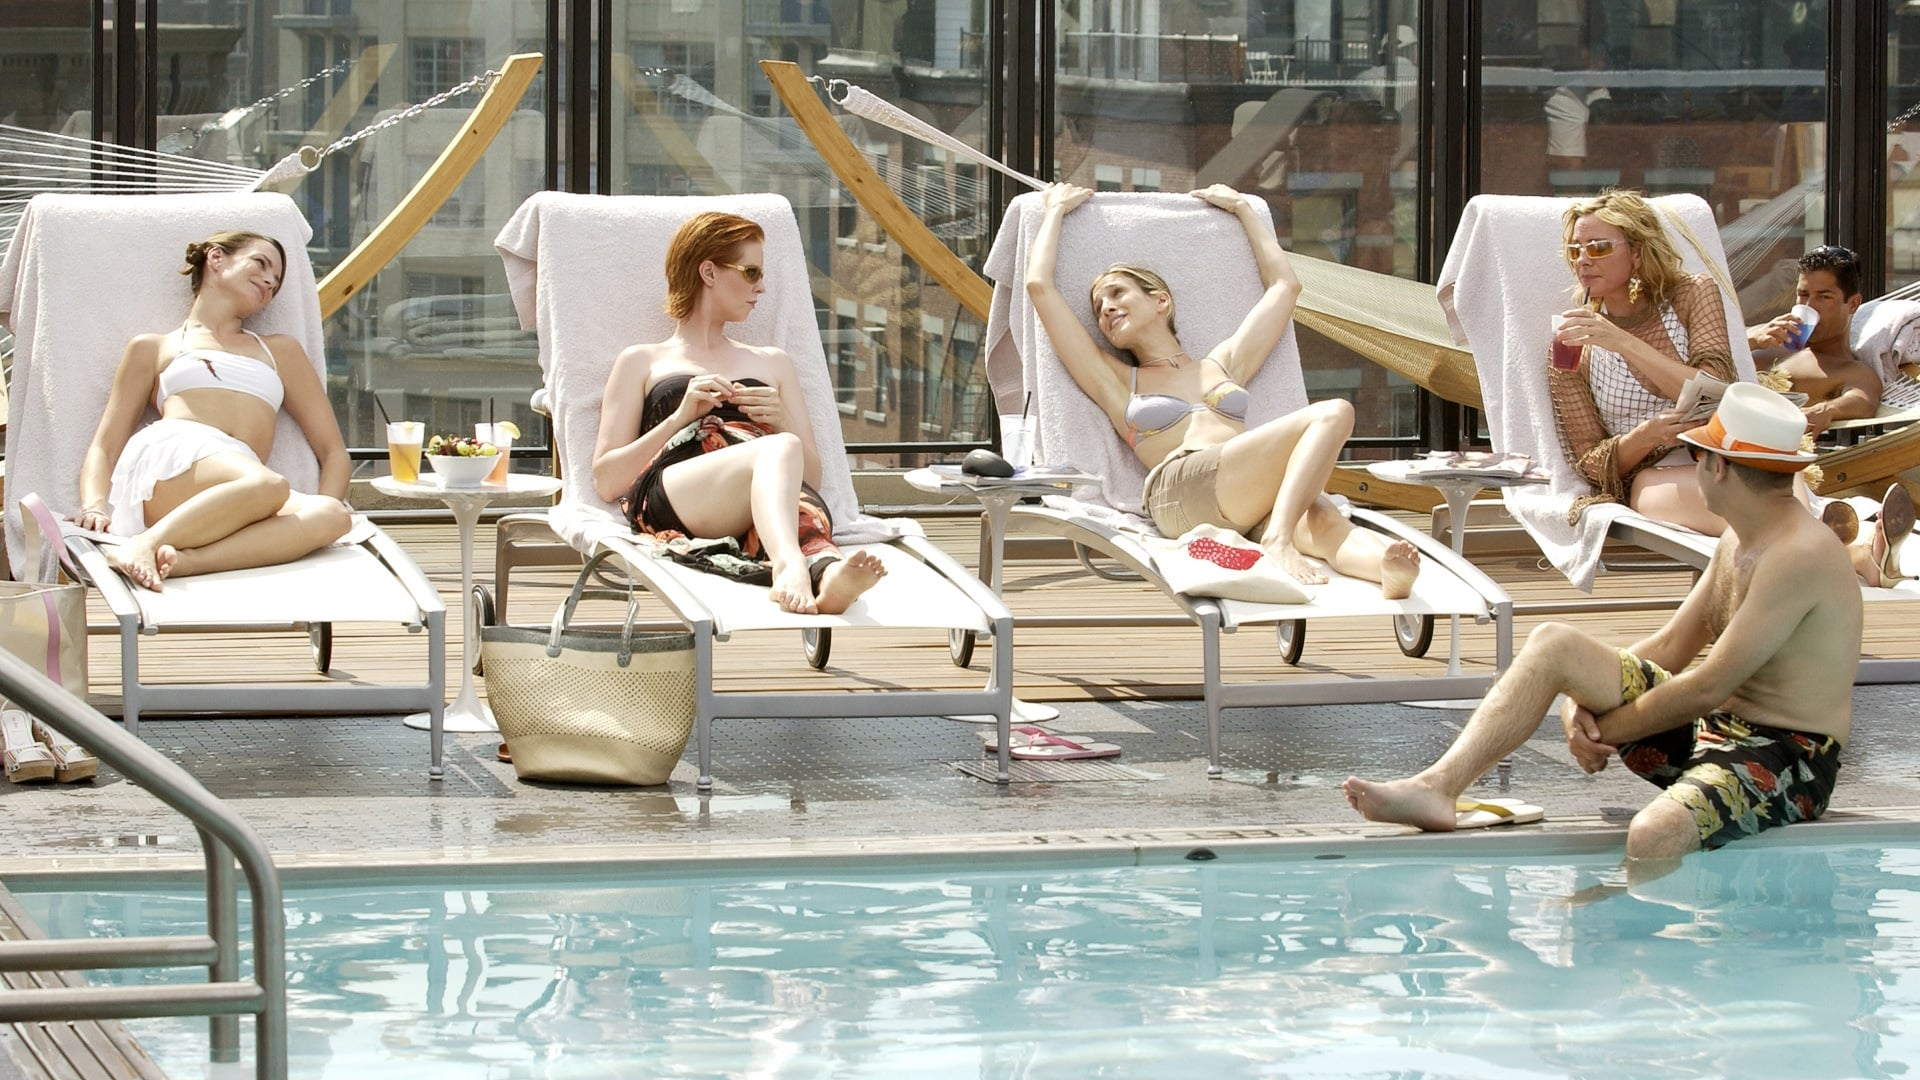 Paris pearl thong classic nin luxury lingerie